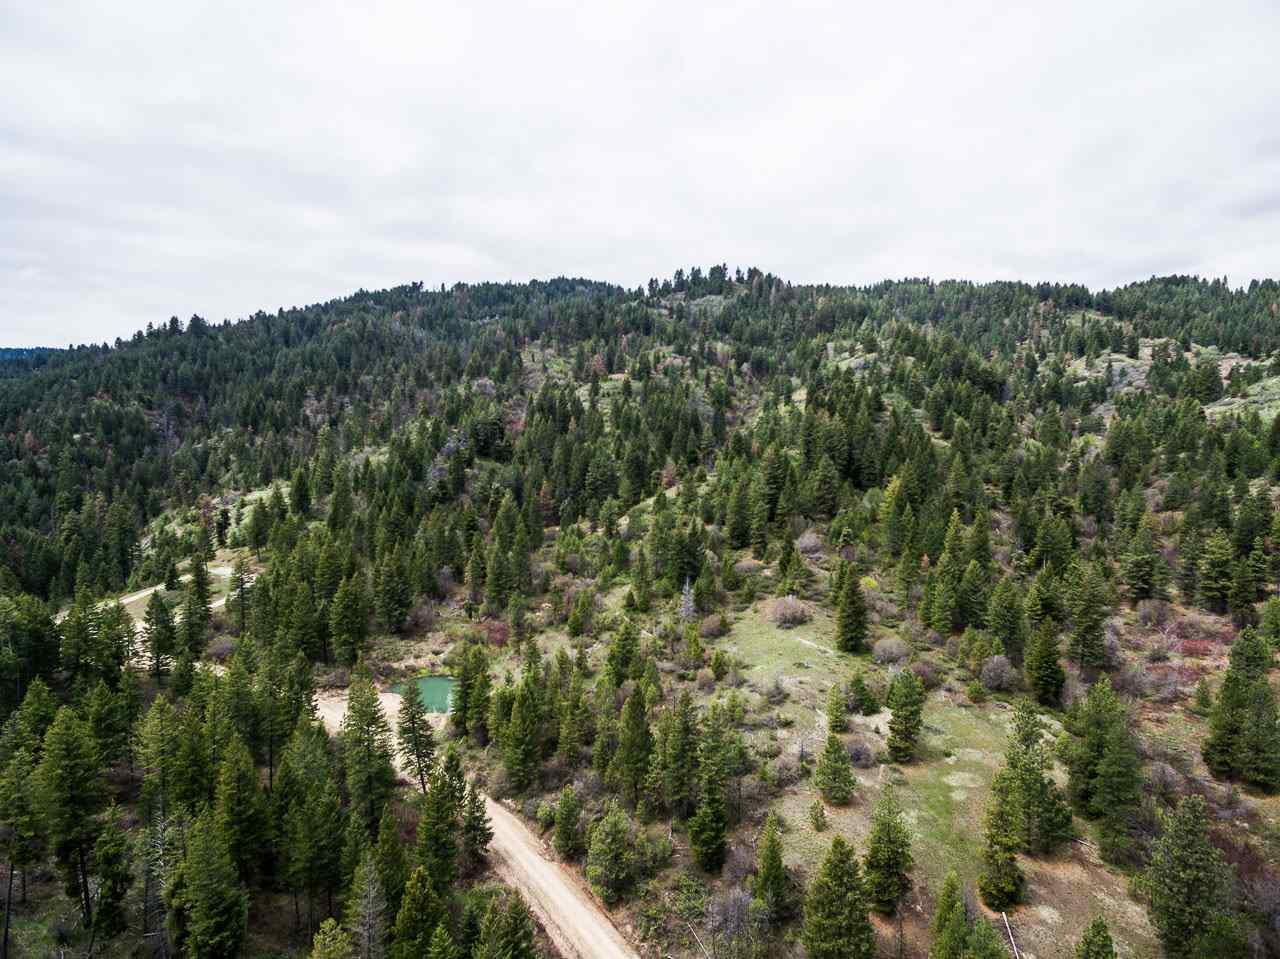 Lot 6 Summit View, Boise, ID 83716